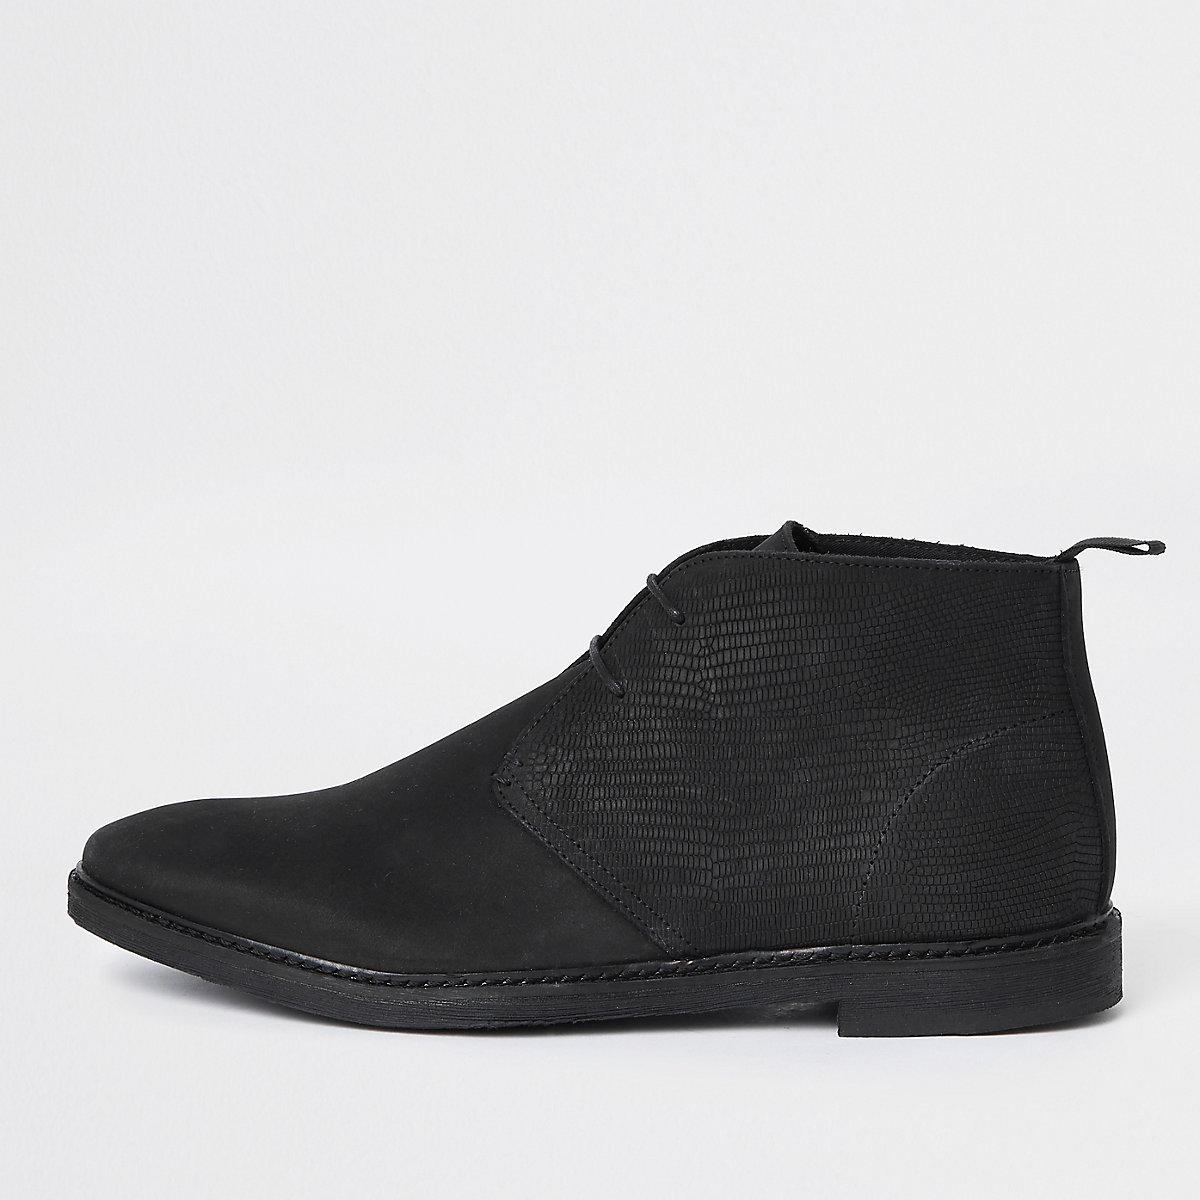 Black nubuck leather lace-up desert boots